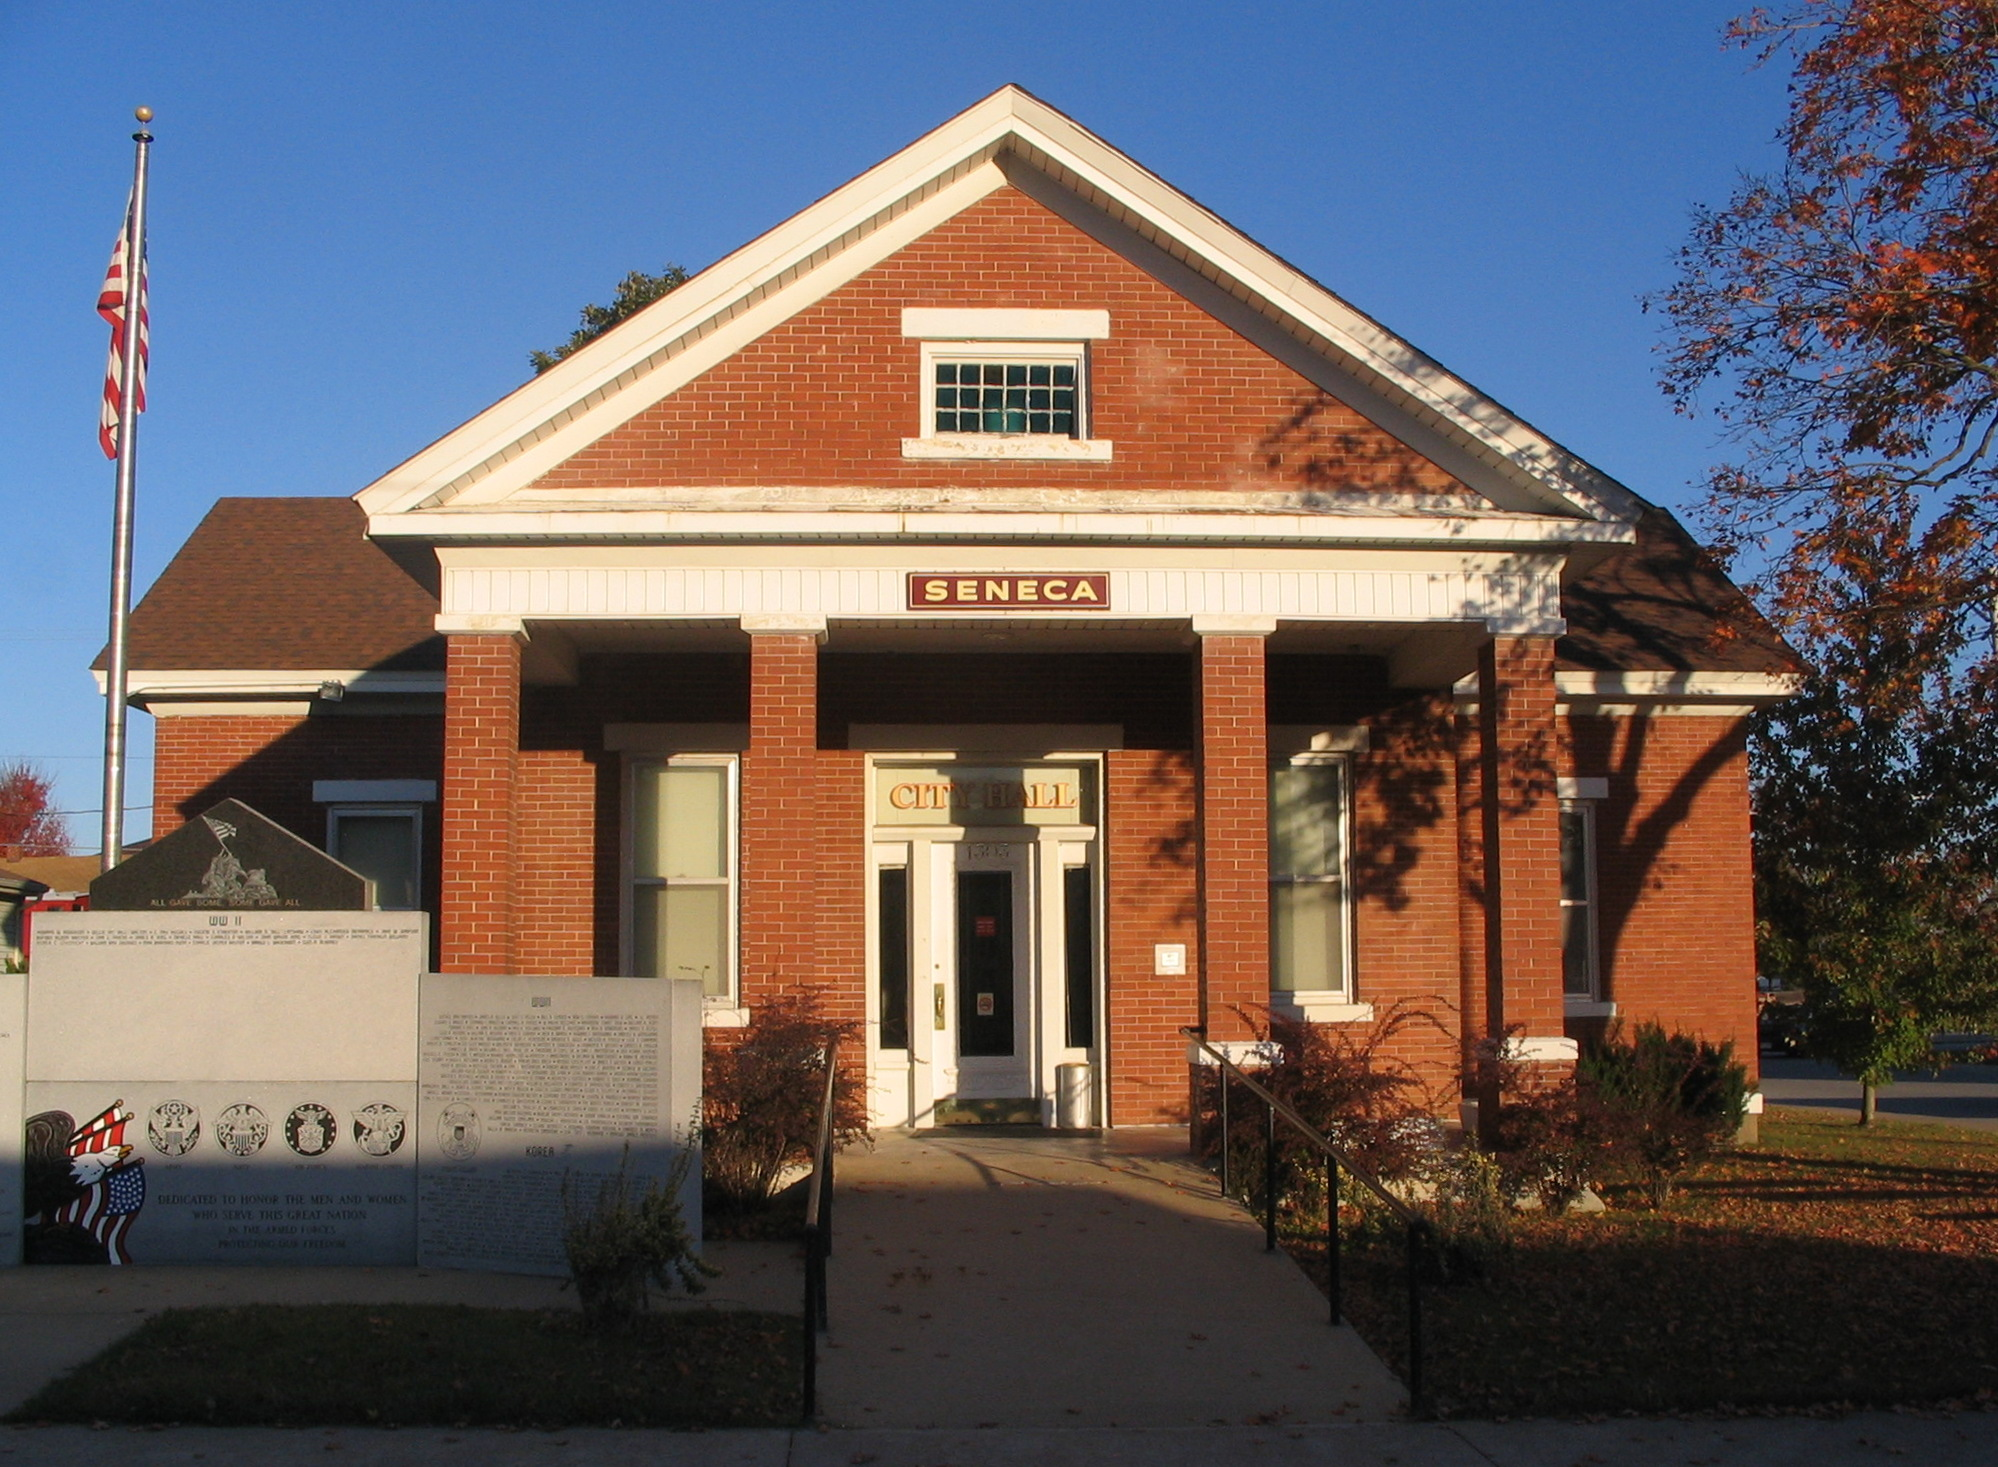 Seneca_MO_City_Hall.jpg